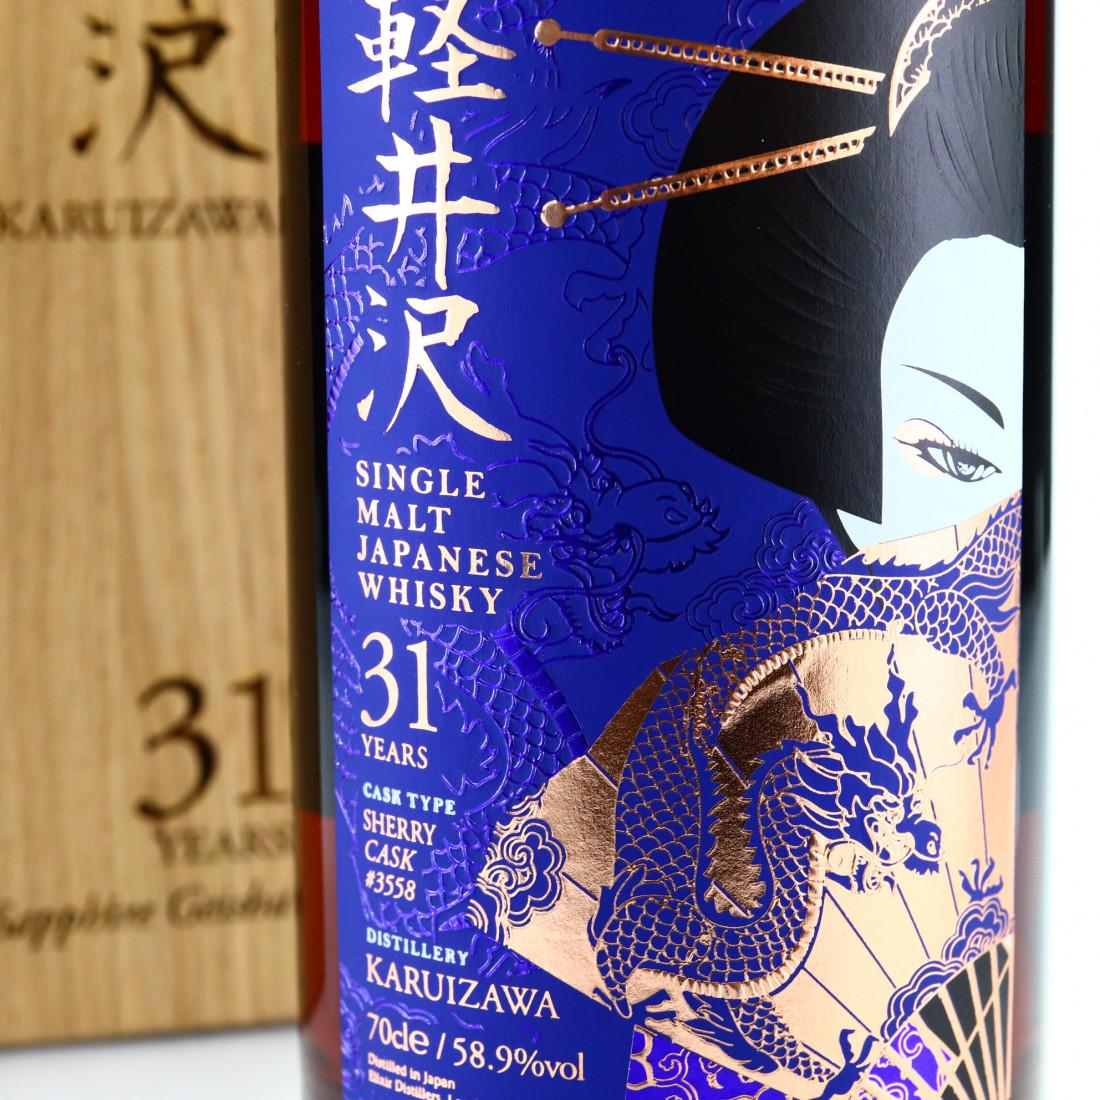 Karuizawa 31 Year Old Single Sherry Cask #3558 / Sapphire Geisha